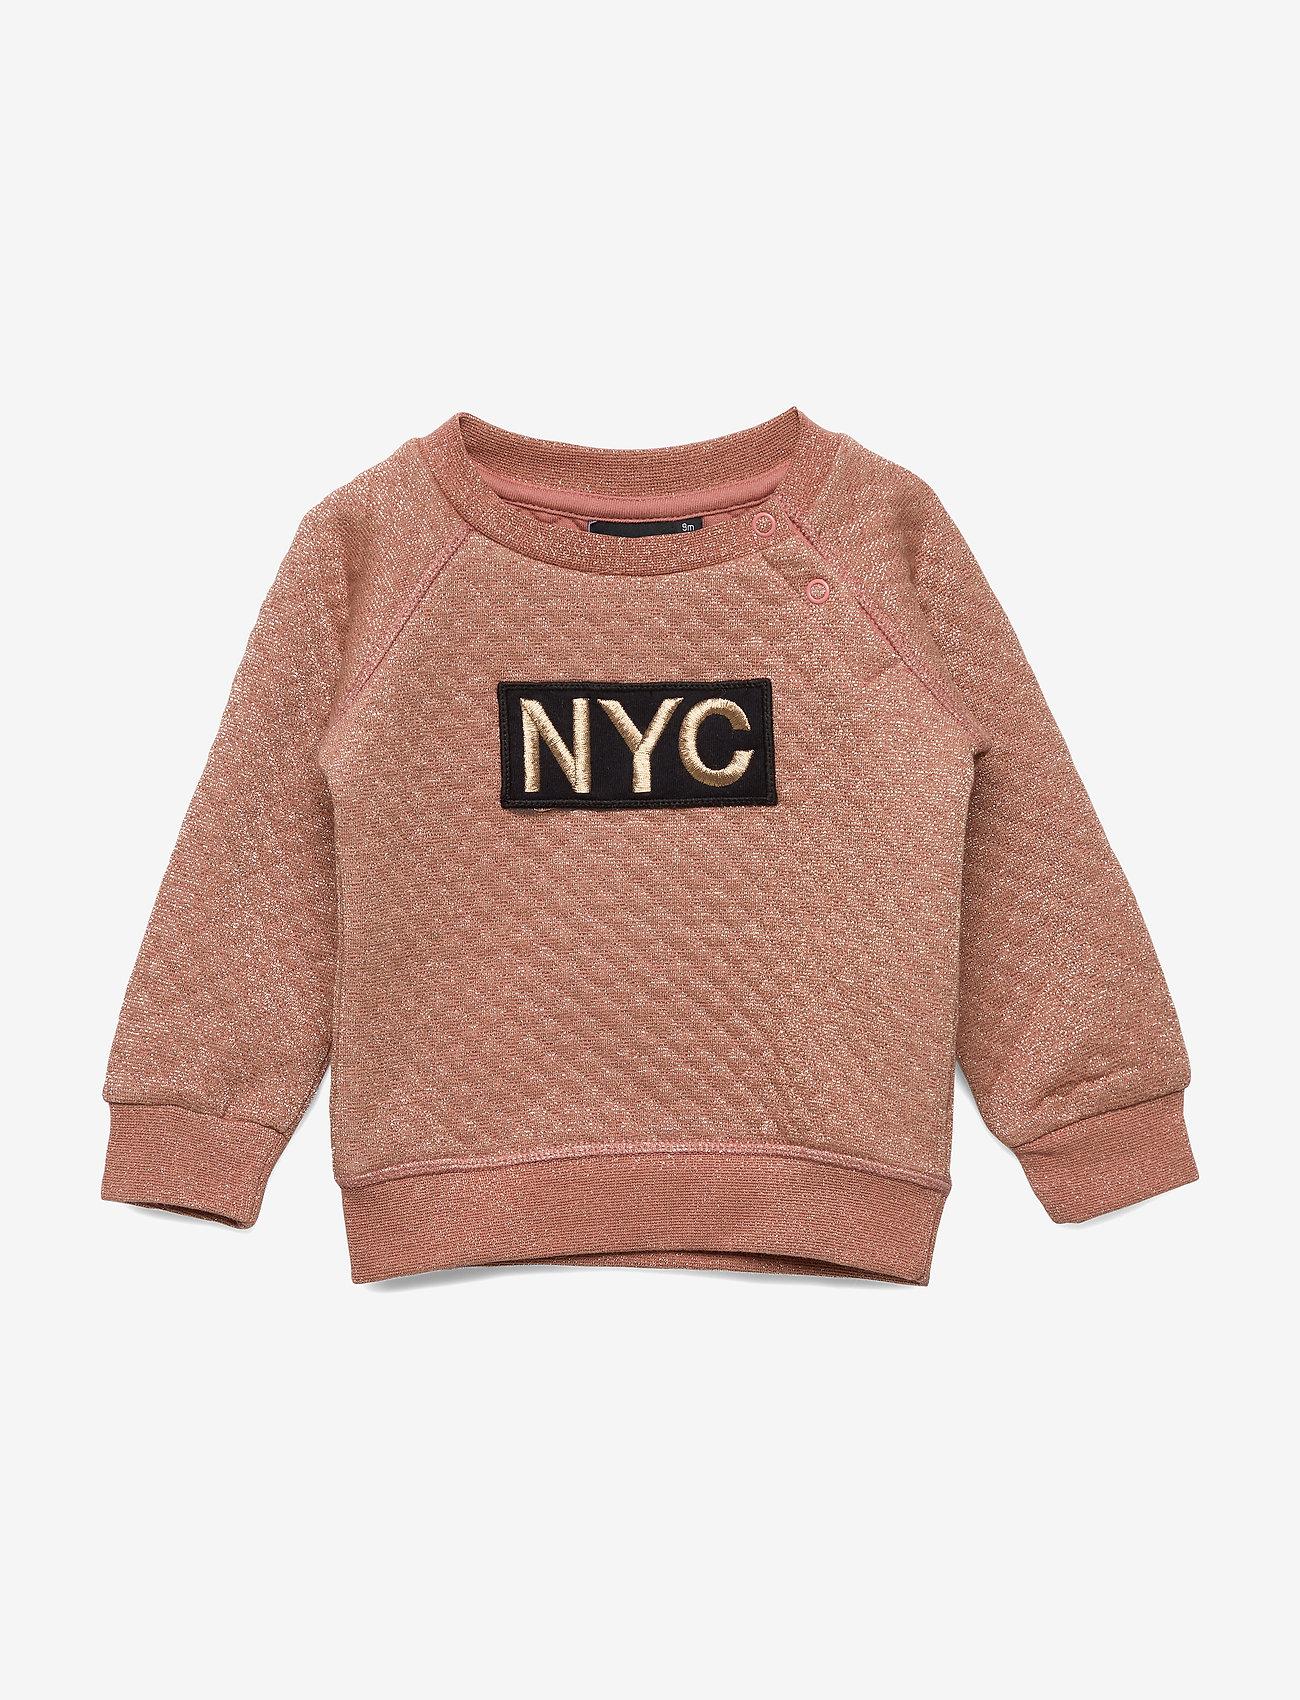 Petit by Sofie Schnoor - Sweat - sweatshirts - dusty rose - 0